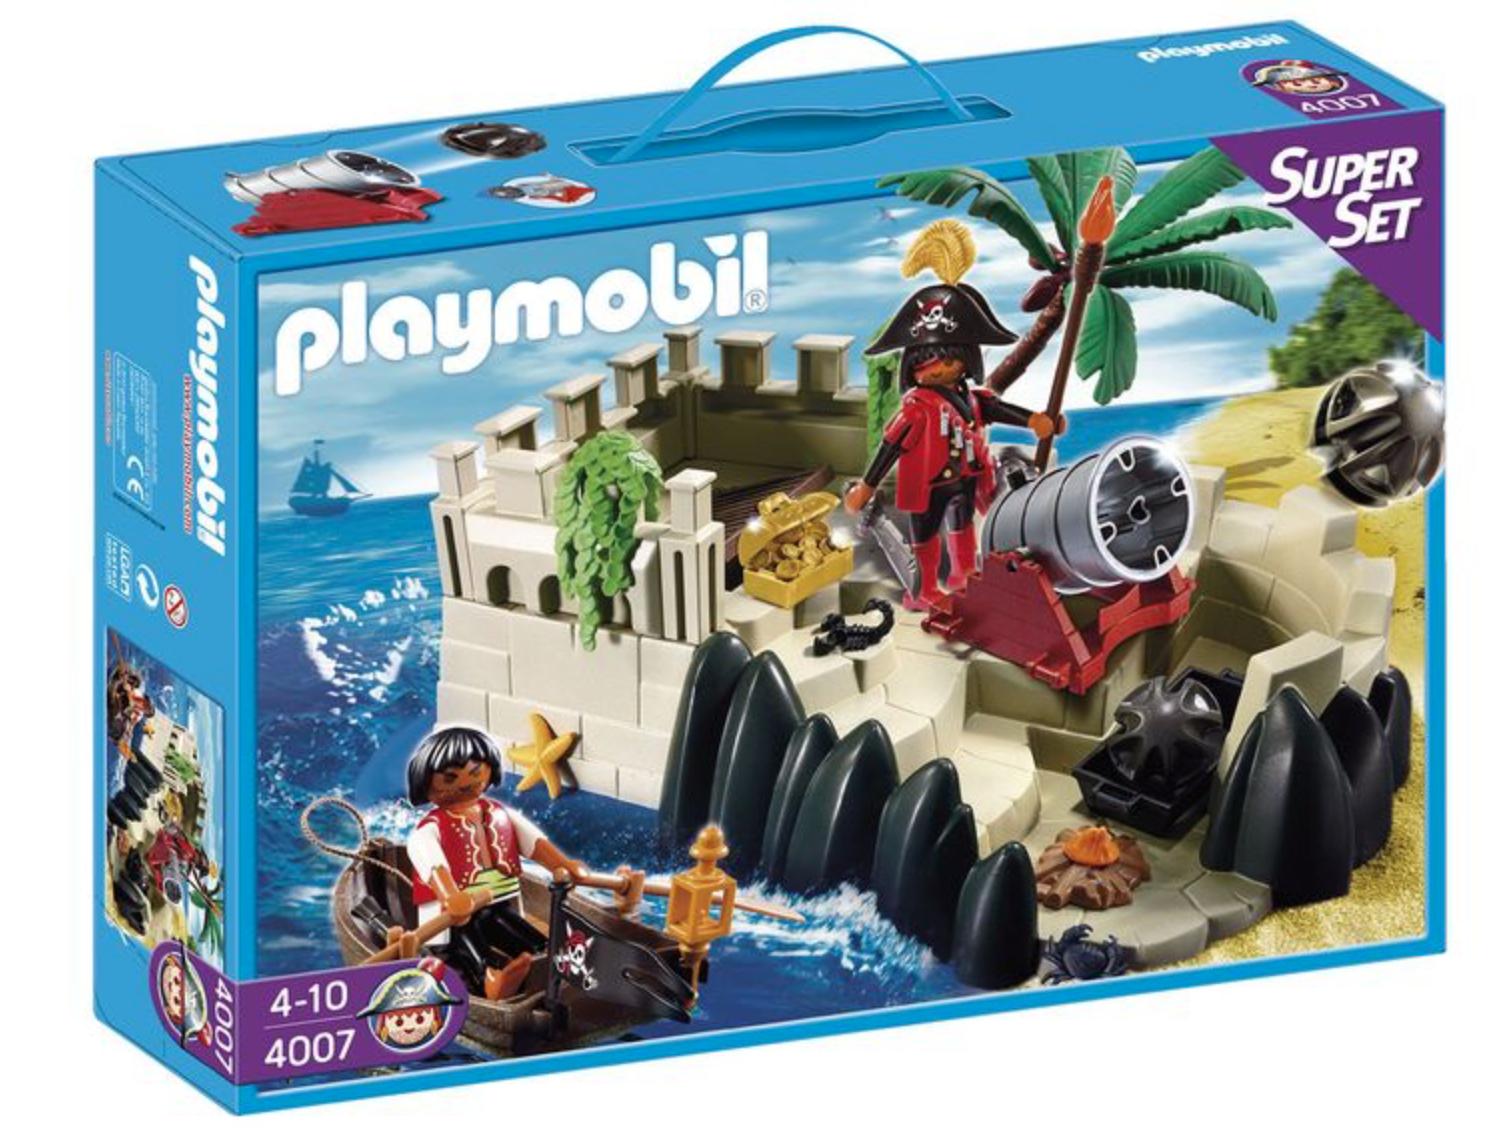 Playmobil Sets im Angebot bei [Lidl] z.B. Piratenfestung SuperSet